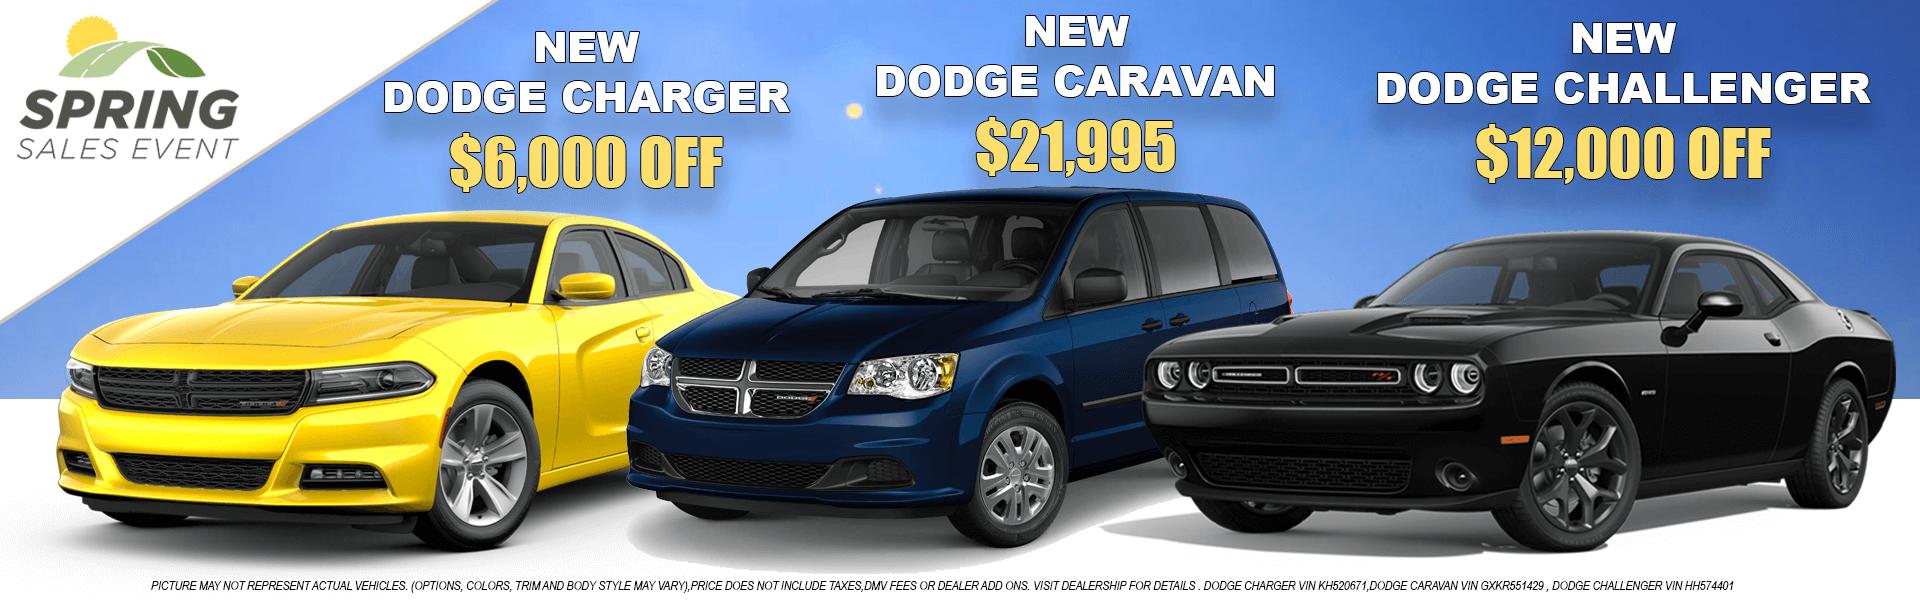 Dodge 3 Cars-Spring Sales Event